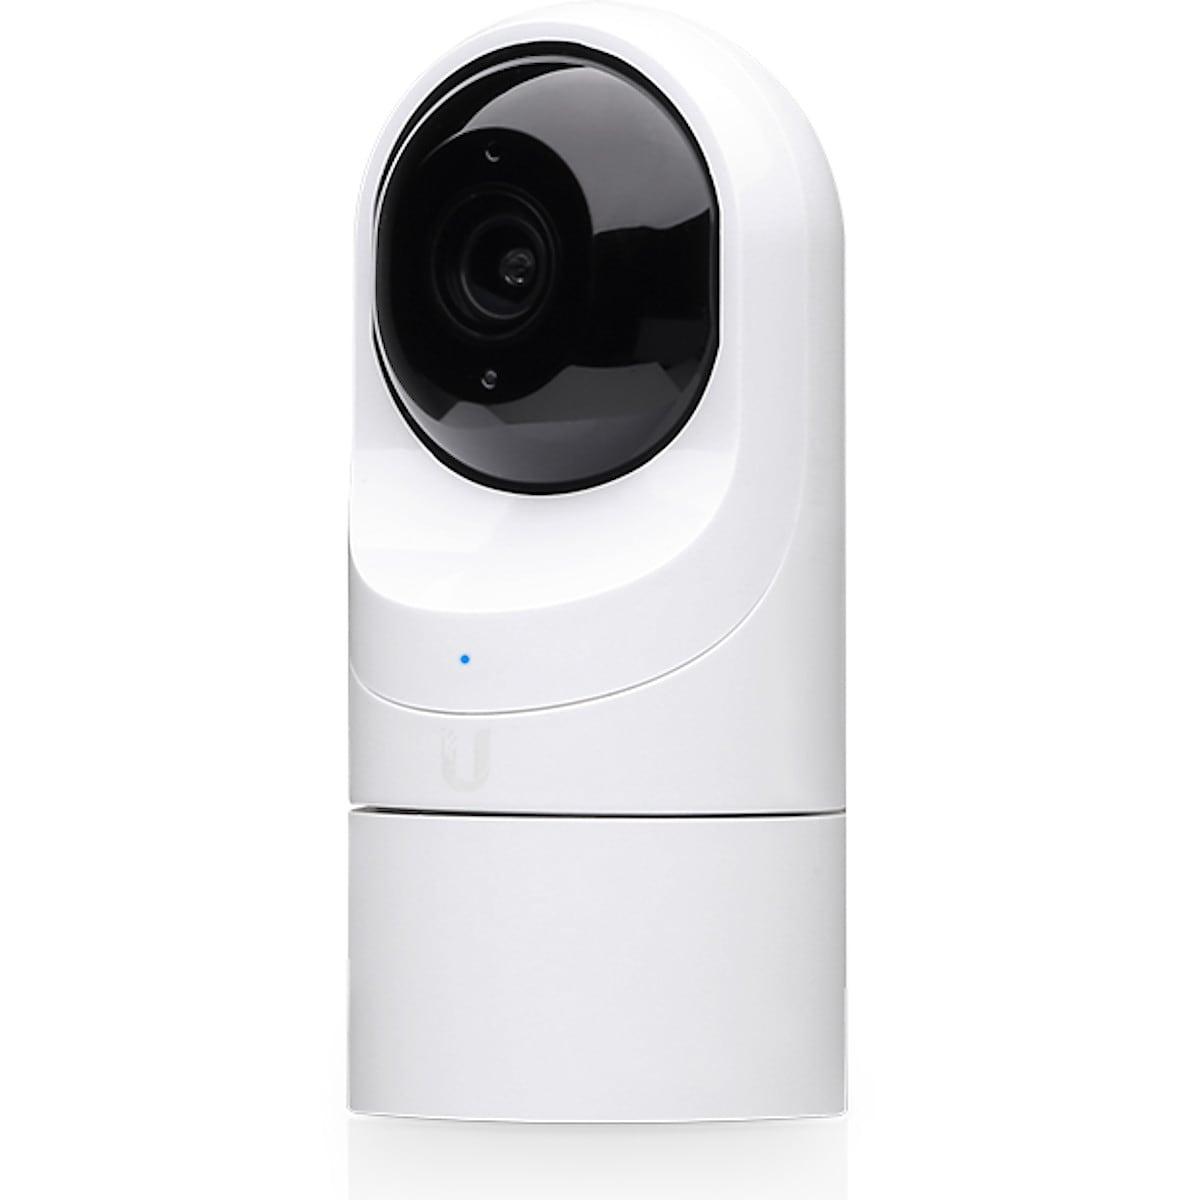 Övervakningskamera Ubiquiti UniFi UVC-G3-FLEX